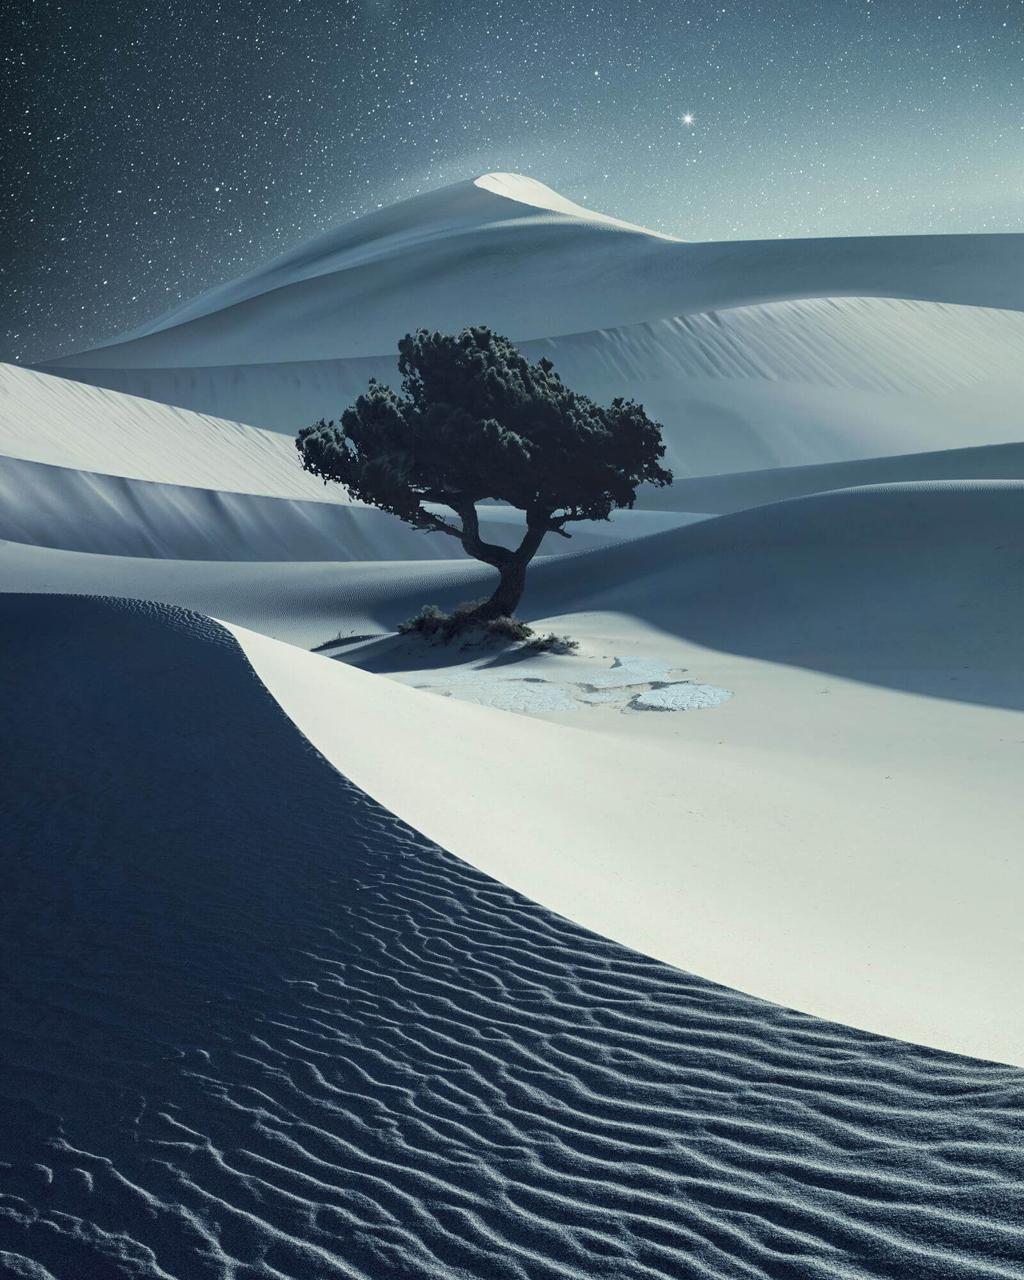 Landscape category winner: Benjamin Everett